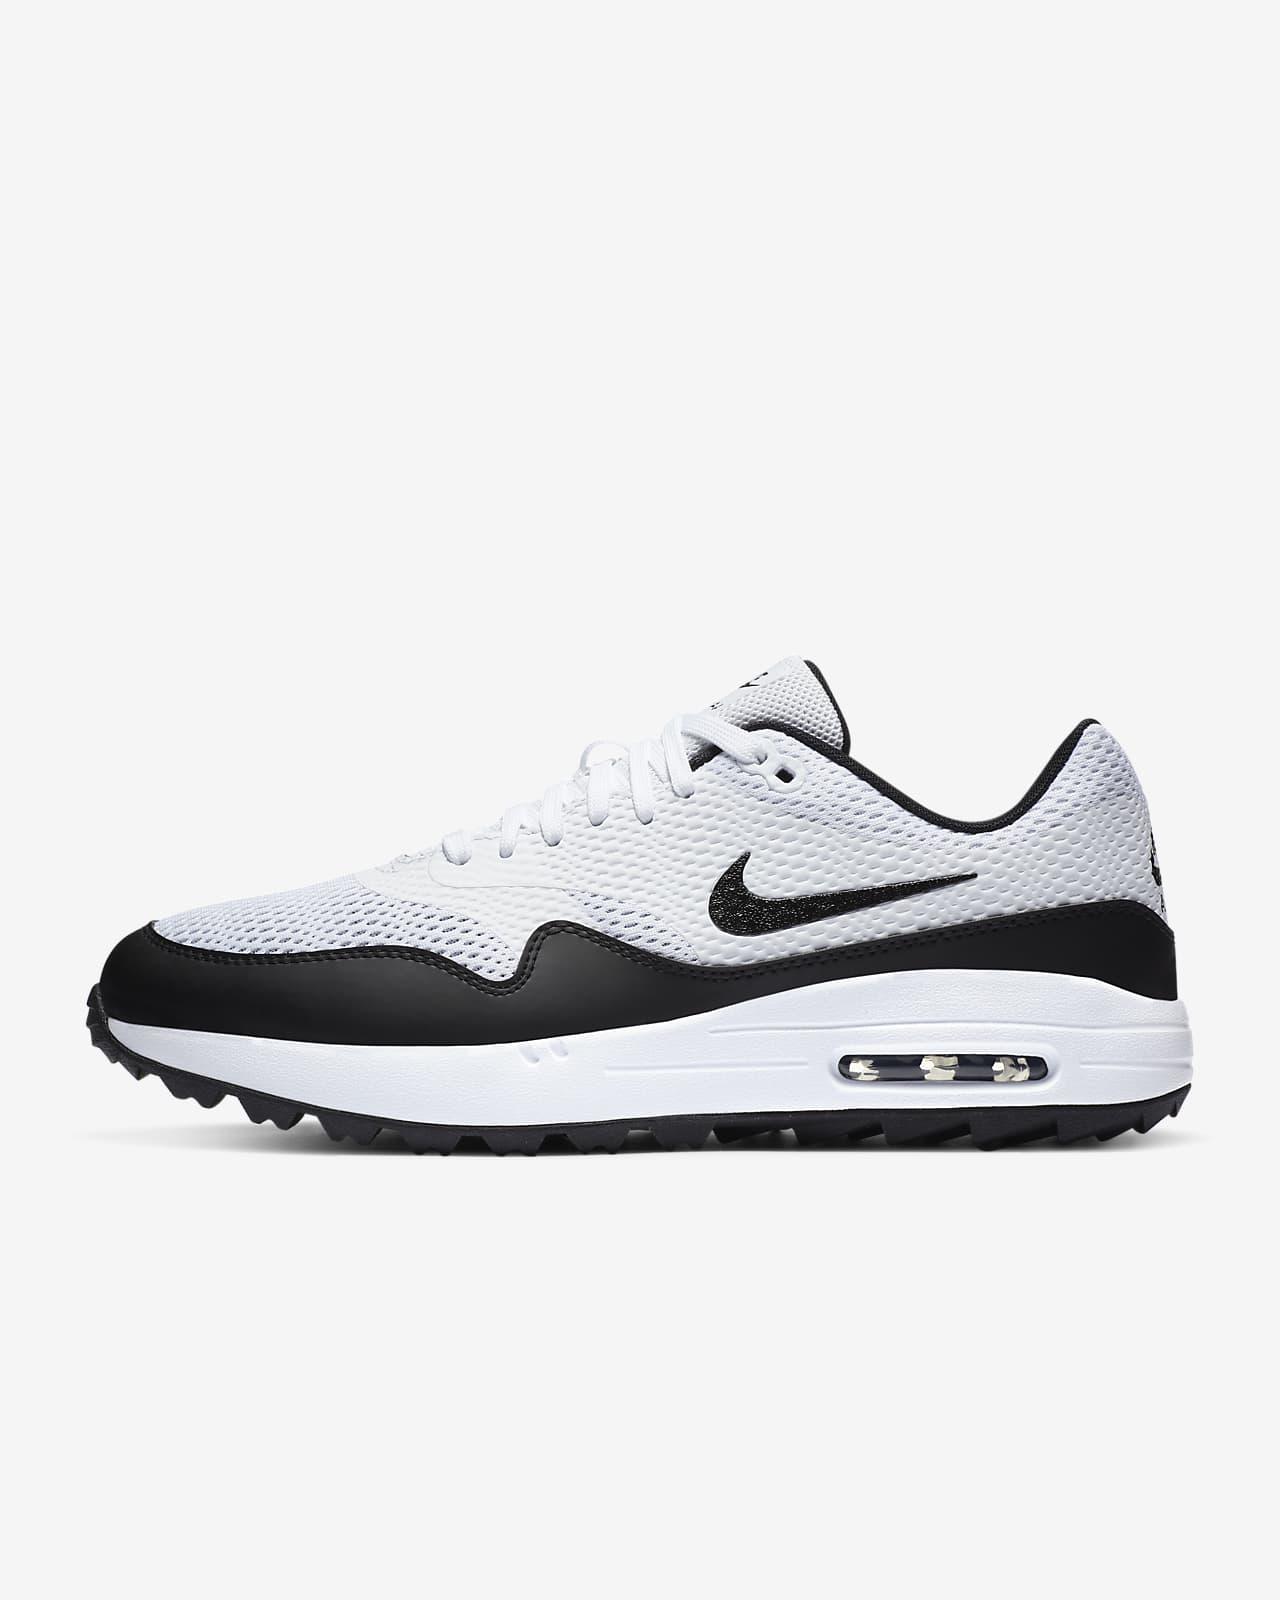 Sapatilhas de golfe Nike Air Max 1 G para homem